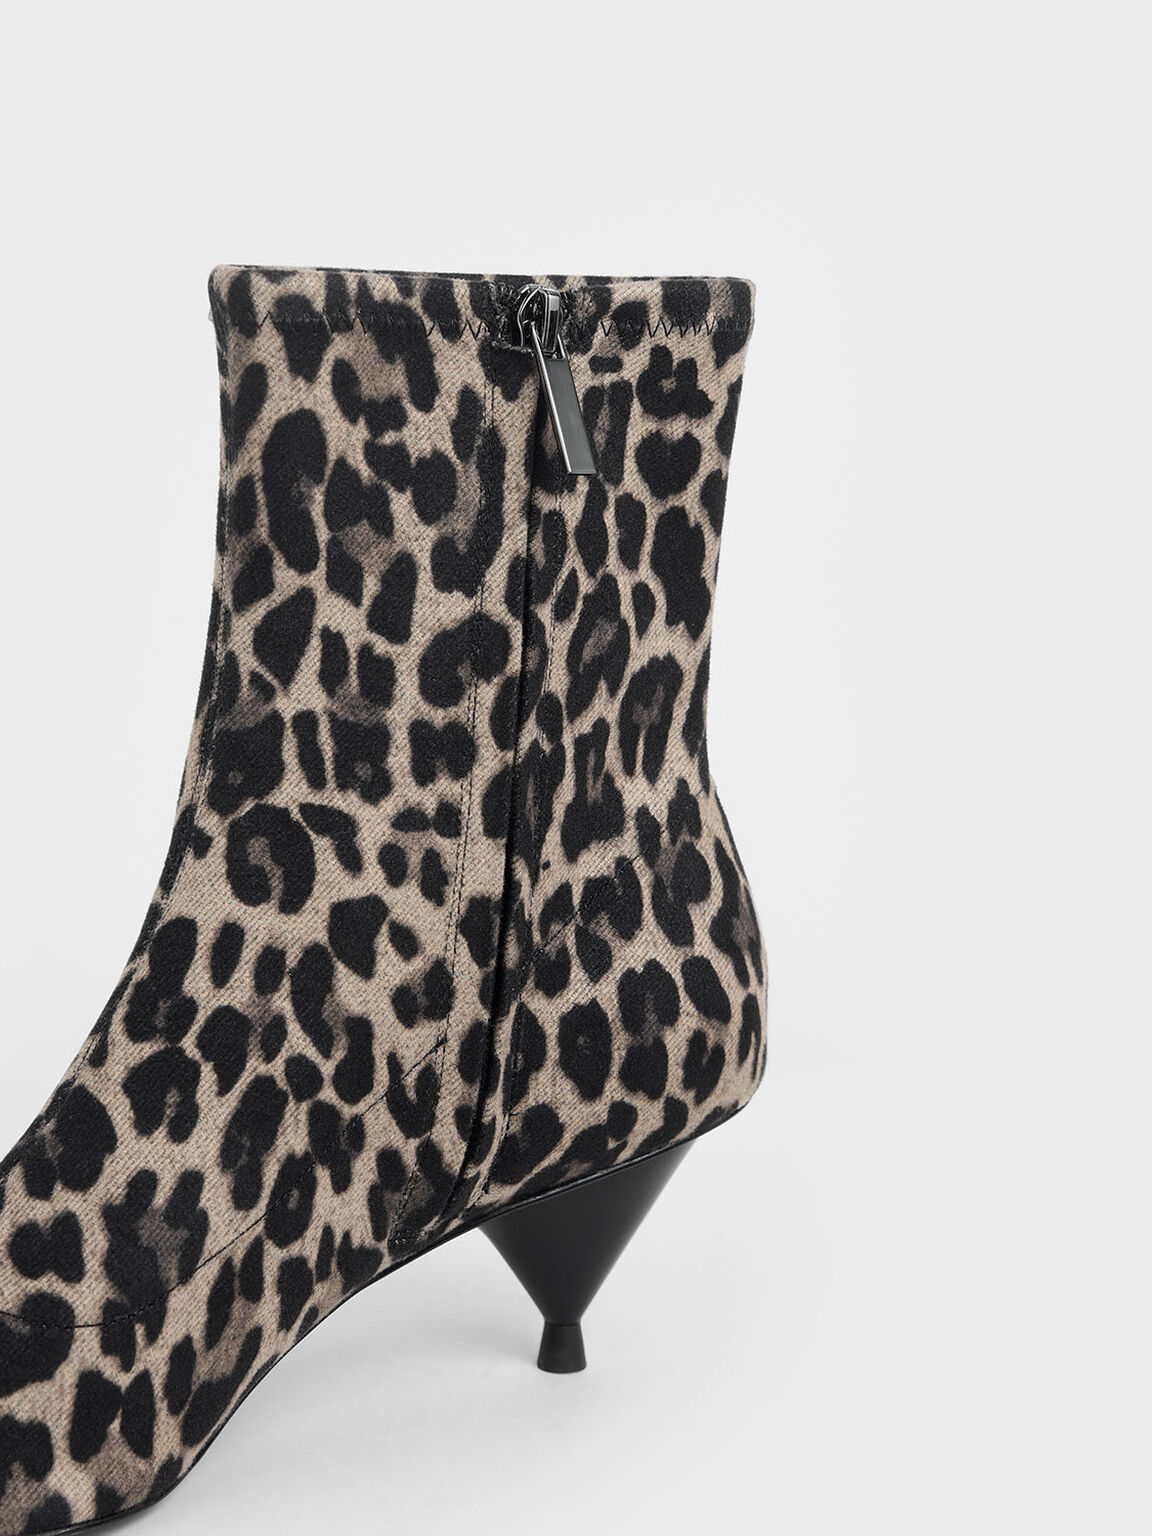 Leopard Print Ankle Boots, Multi, hi-res